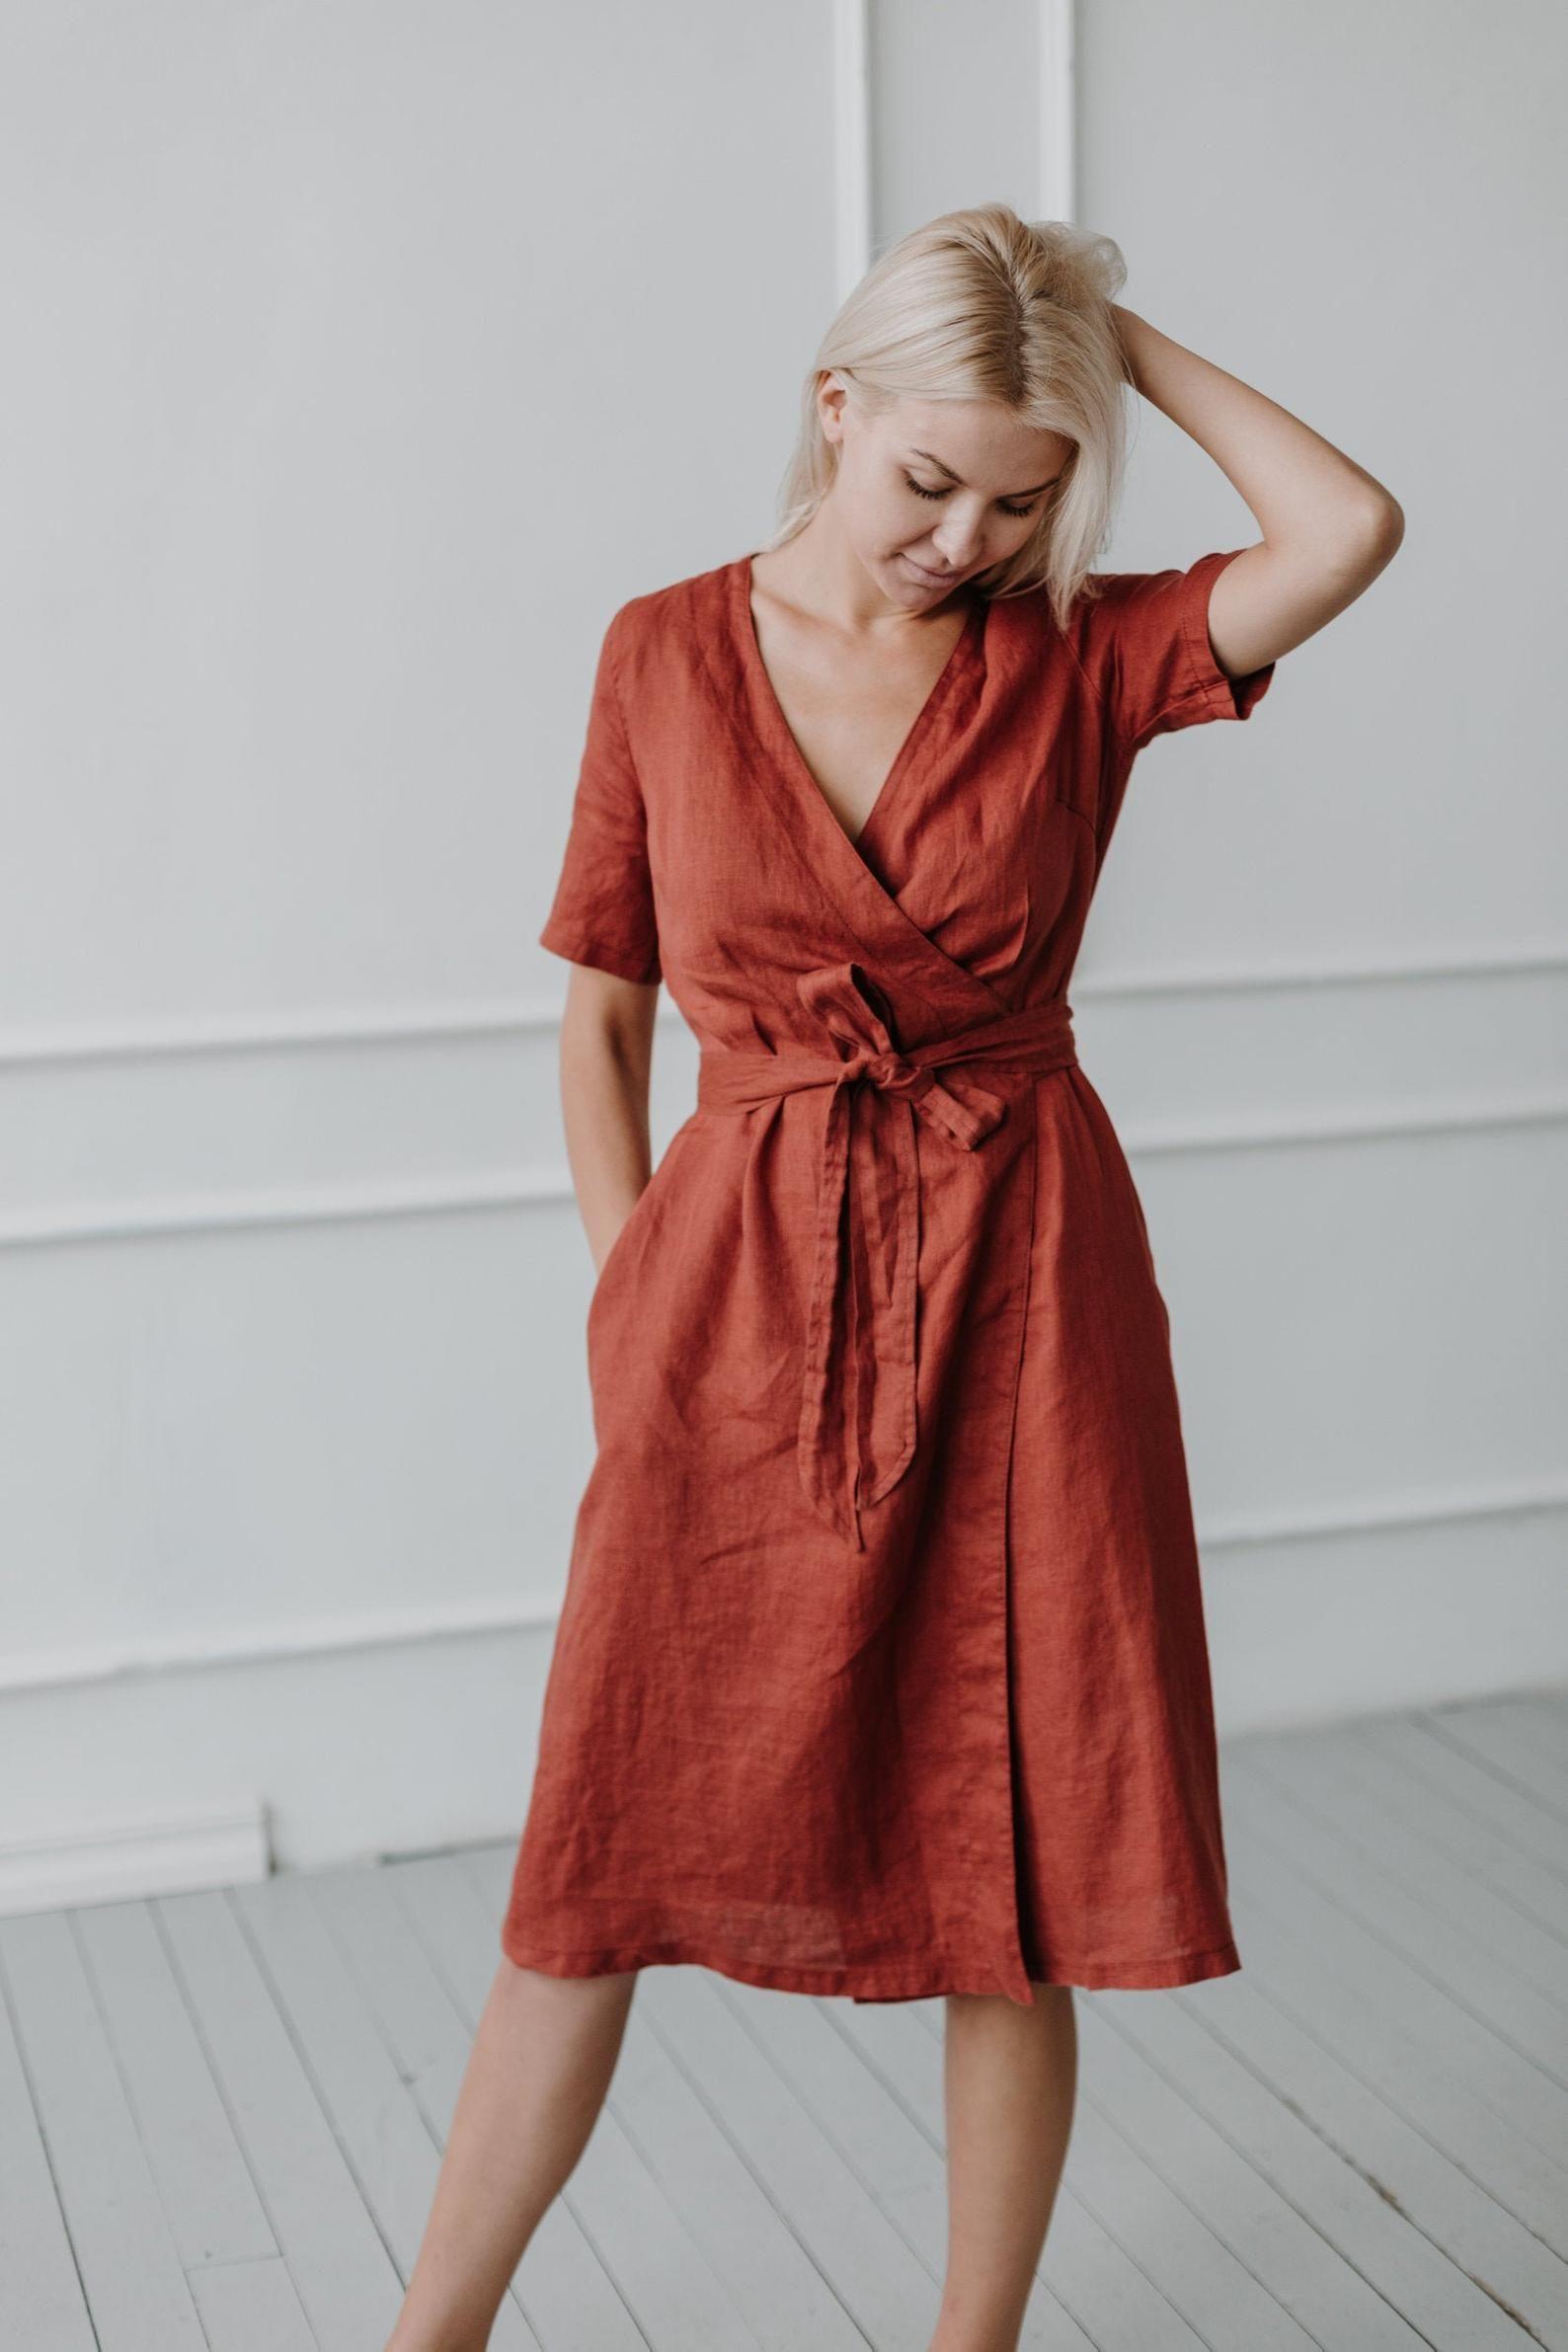 100% Linen Wrap Dress/ Linen Dress Plus Size/ Loose Linen Dress/ Flax Soft Dress/ Linen Clothing/ Maternity Dress / Casual